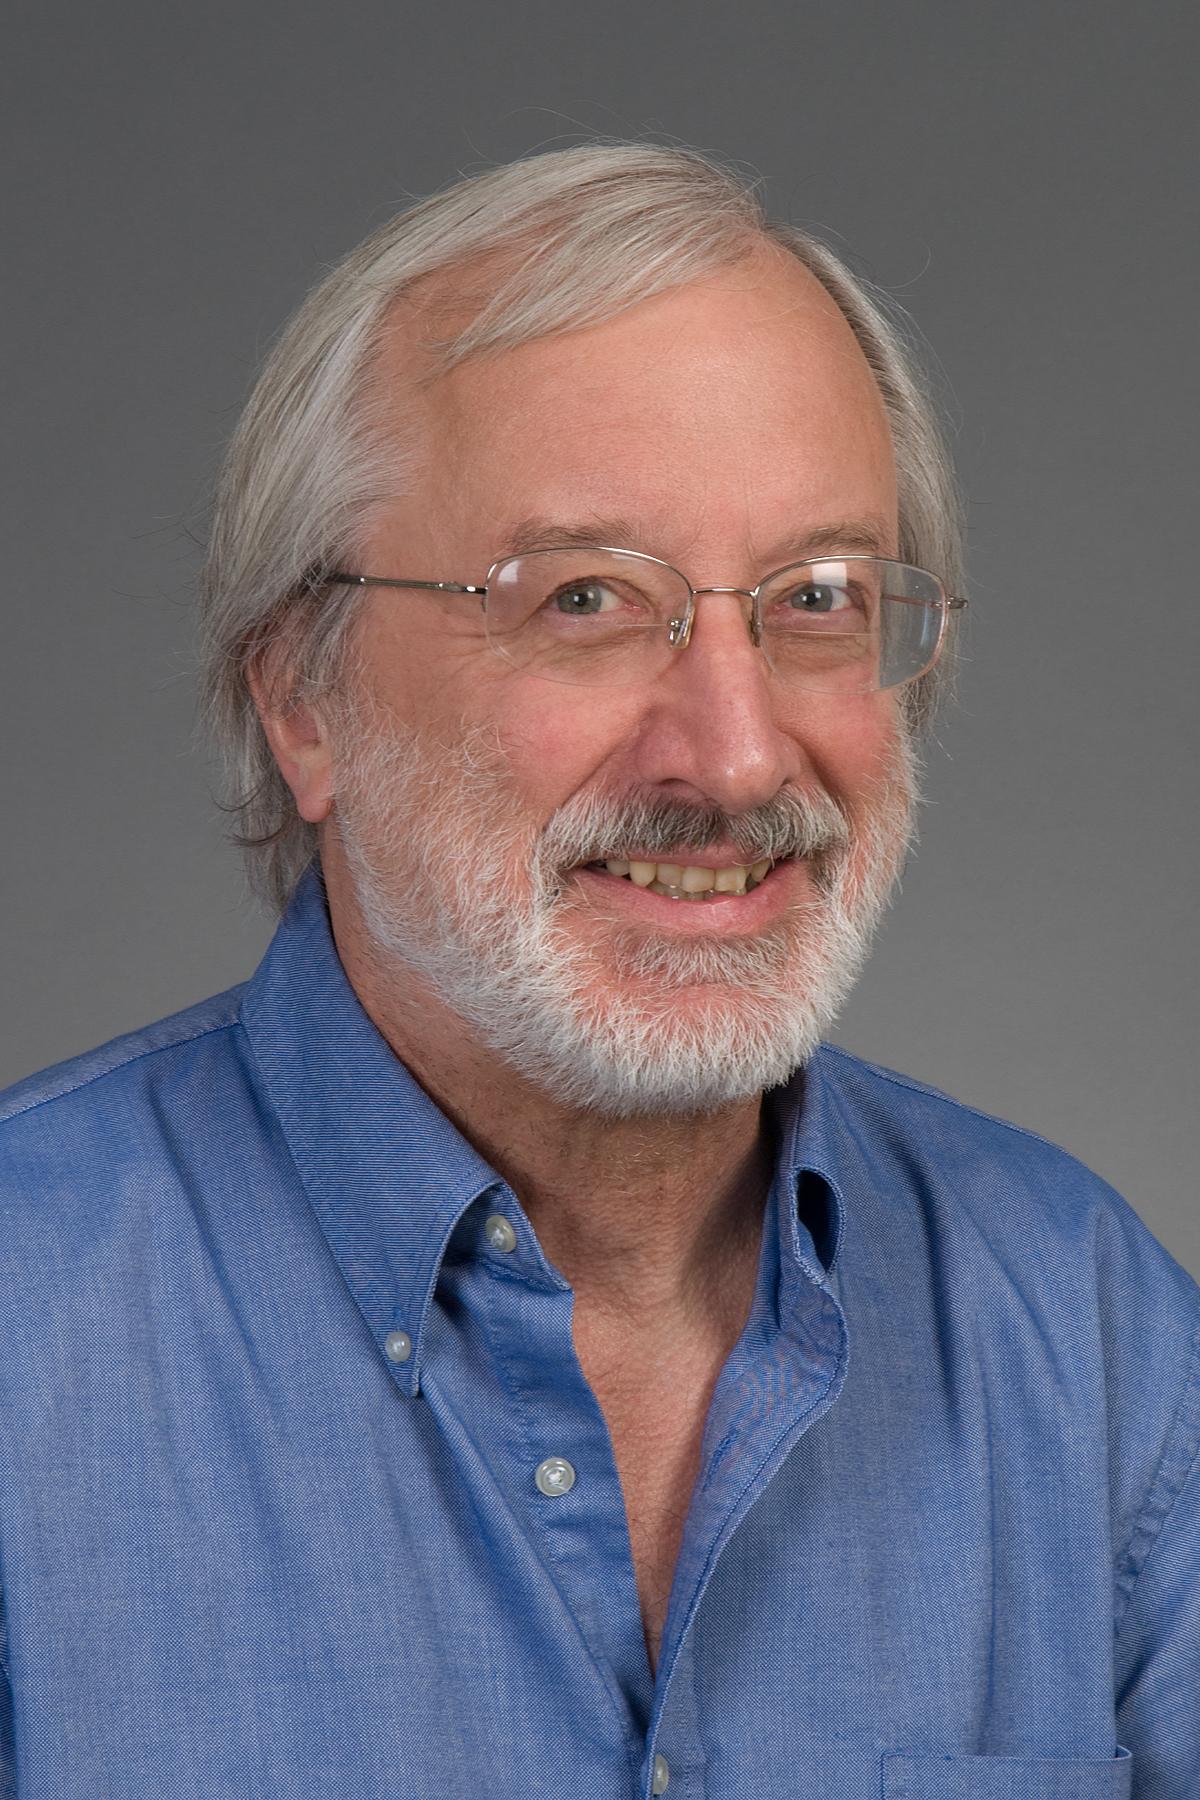 Biochemistry professor Richard Palmiter studies how changes in brain signaling pathways in mice alter behaviors such as feeding.